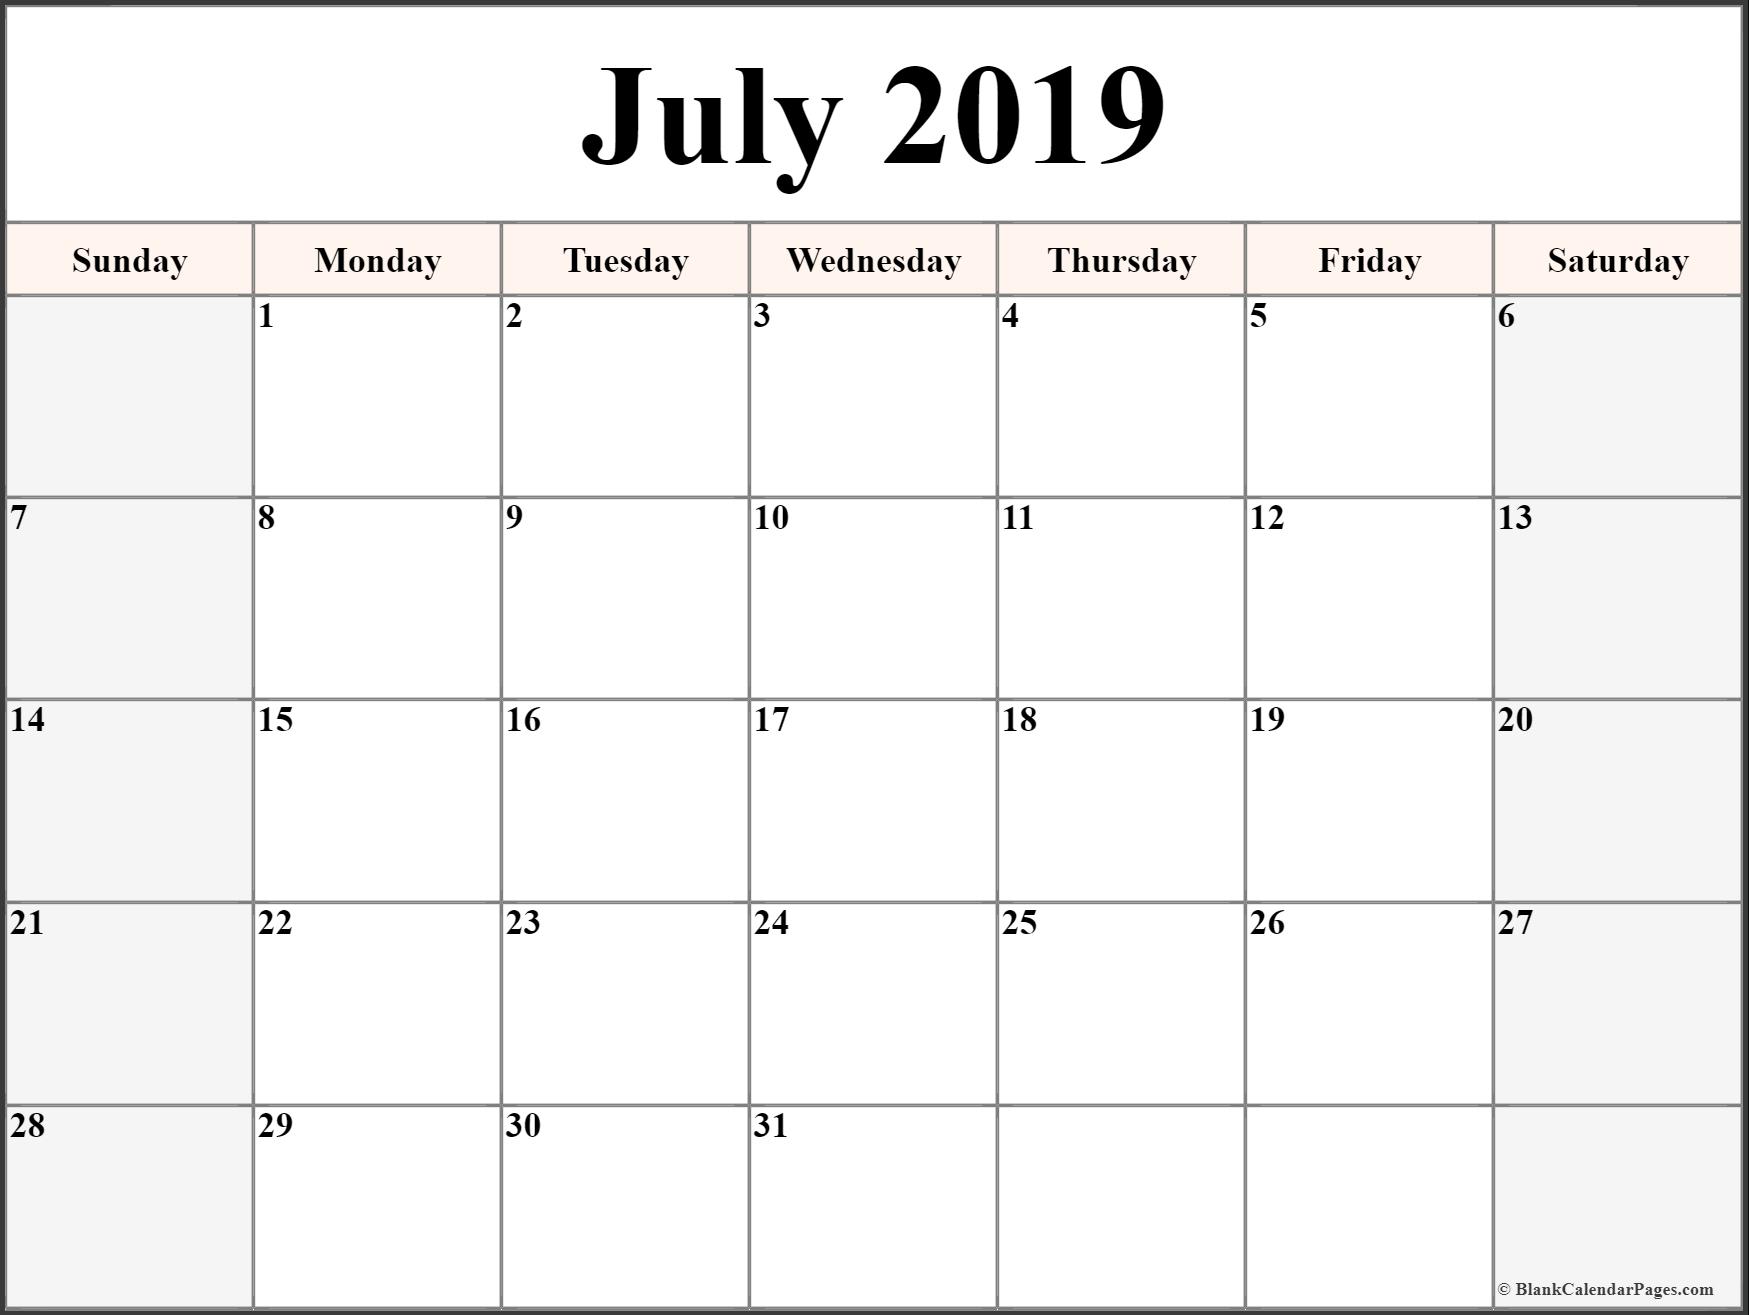 July 2019 Calendar Printable Templates   Site Provides Calendar Calendar Of 2019 July